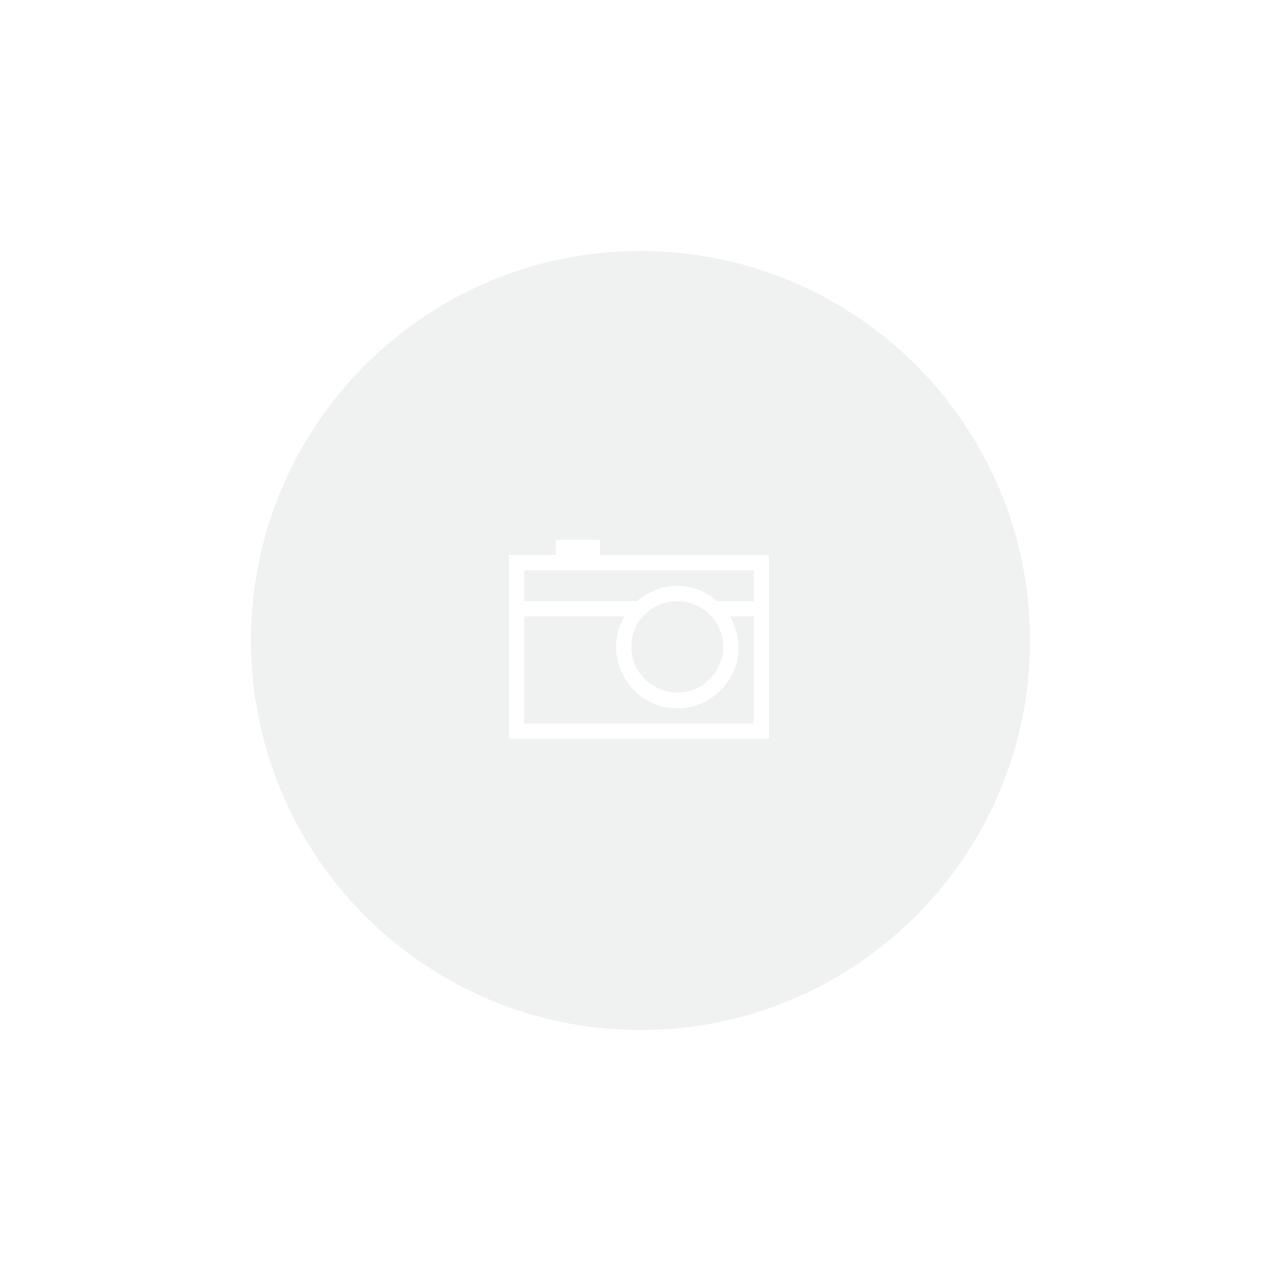 Batedor Manual Ovo 8X30 cm